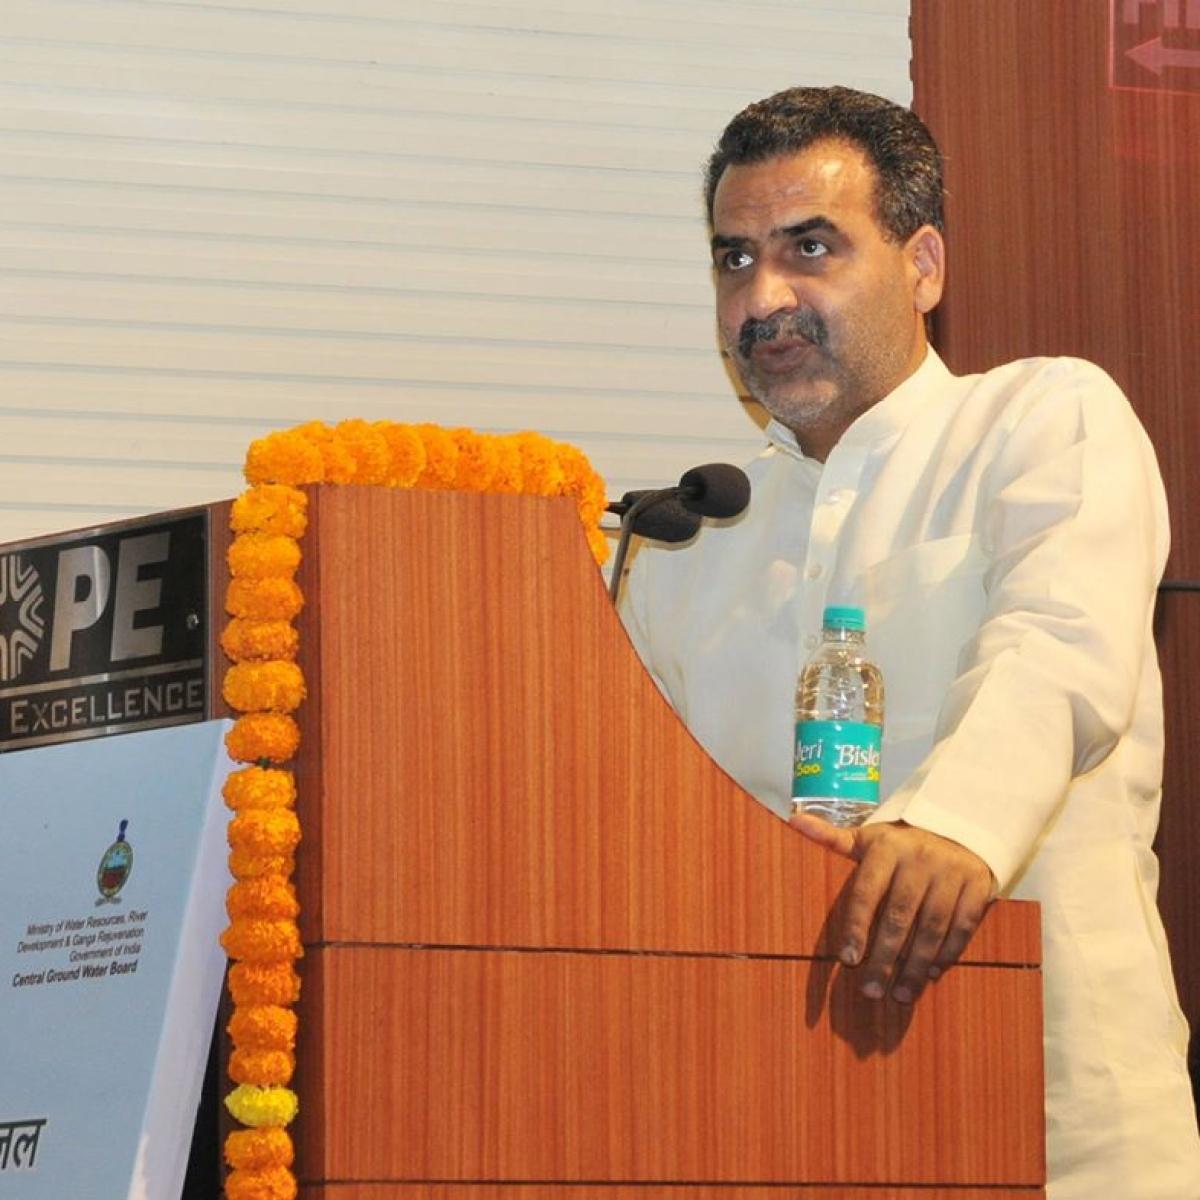 'Another BJP gem': Twitter trolls Union Minister Sanjeev Balyan for 'threatening' JNU, Jamia students